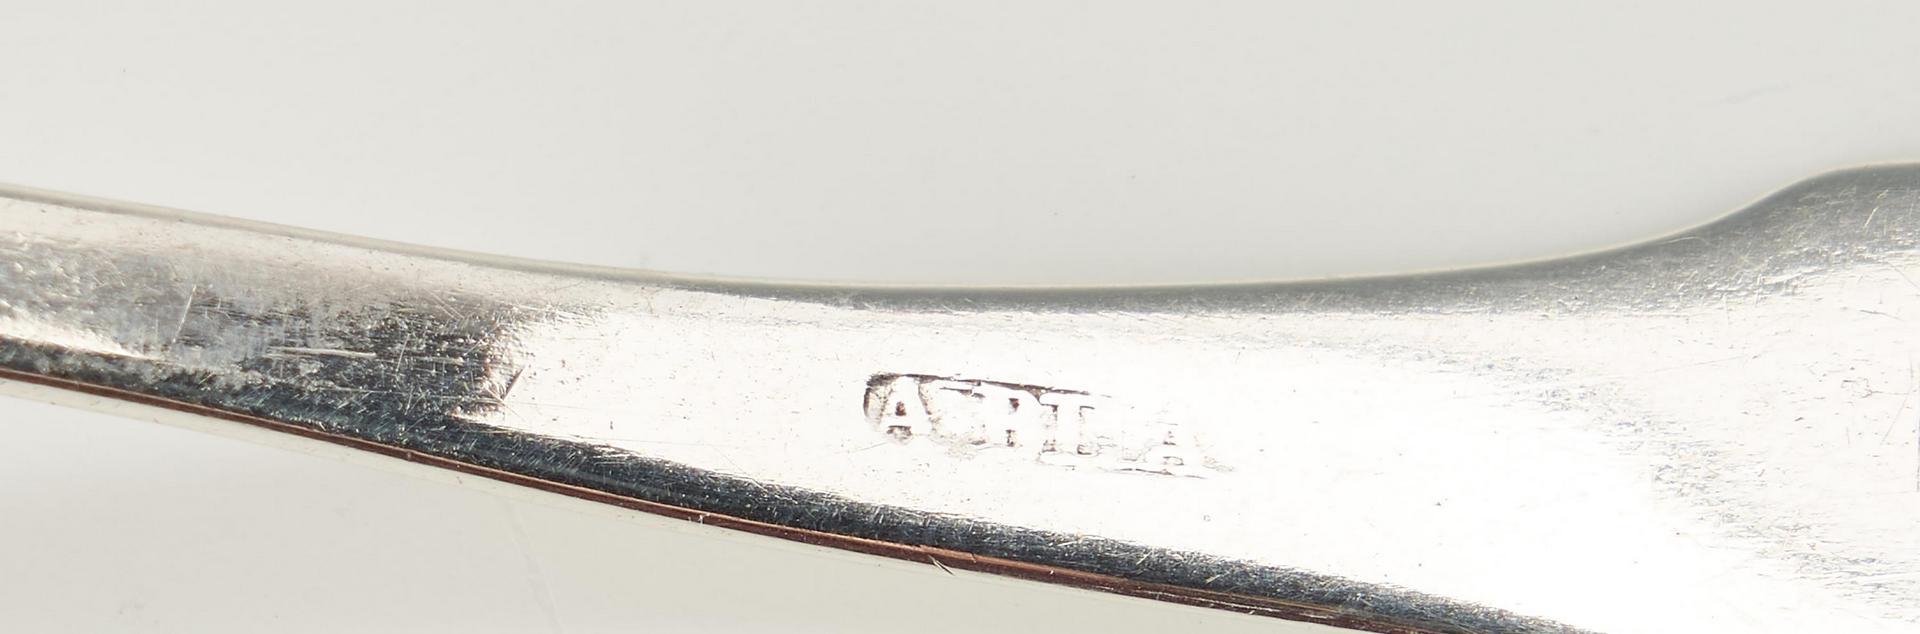 Lot 121: Asa Blanchard KY Coin Silver Tongs & Cream Ladle, 2 items